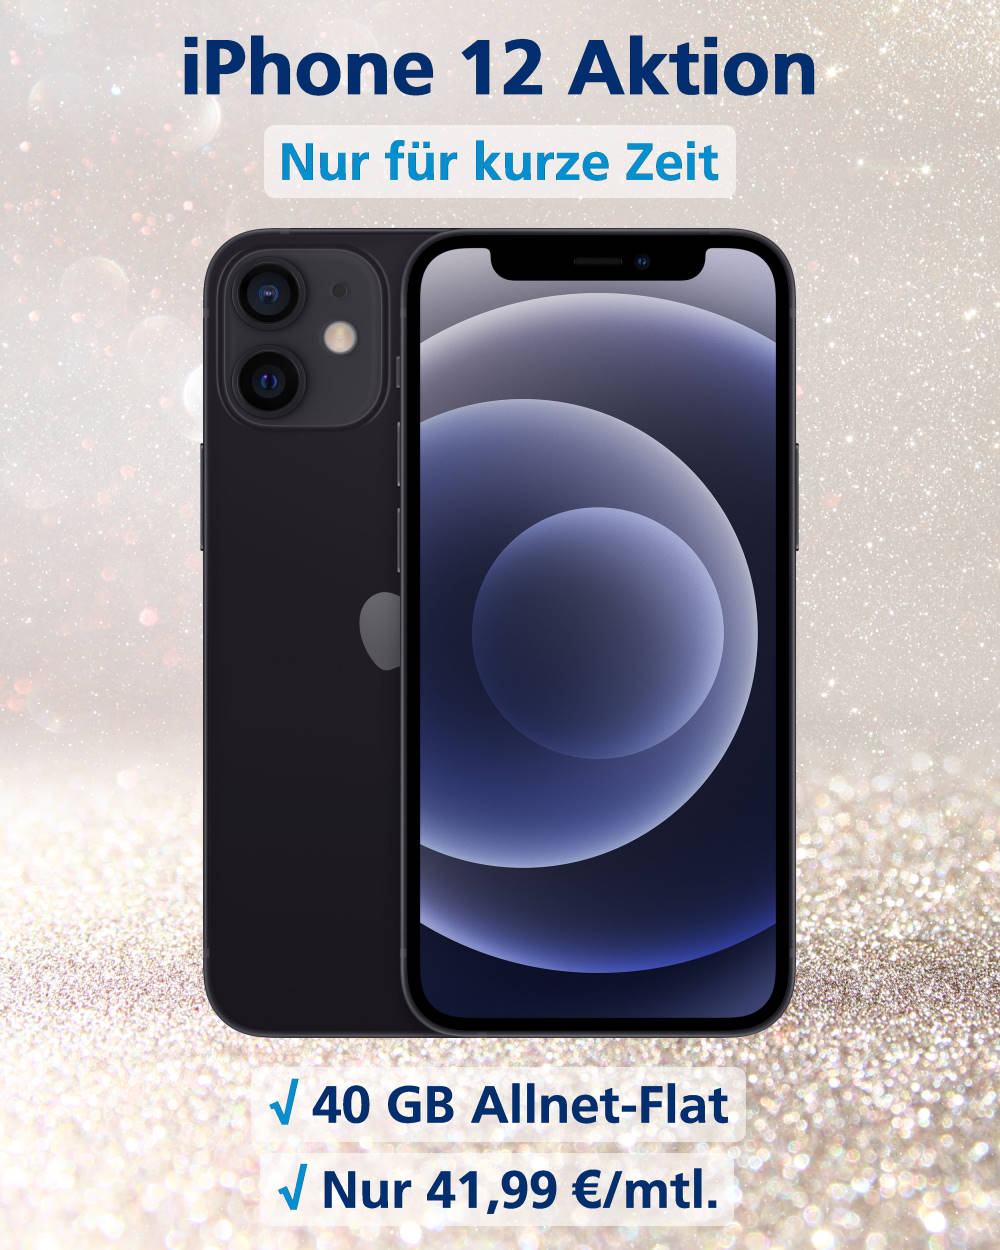 iPhone 12 inkl. 40 GB Allnet-Flat mit EU-Roaming zum unschlagbaren Preis